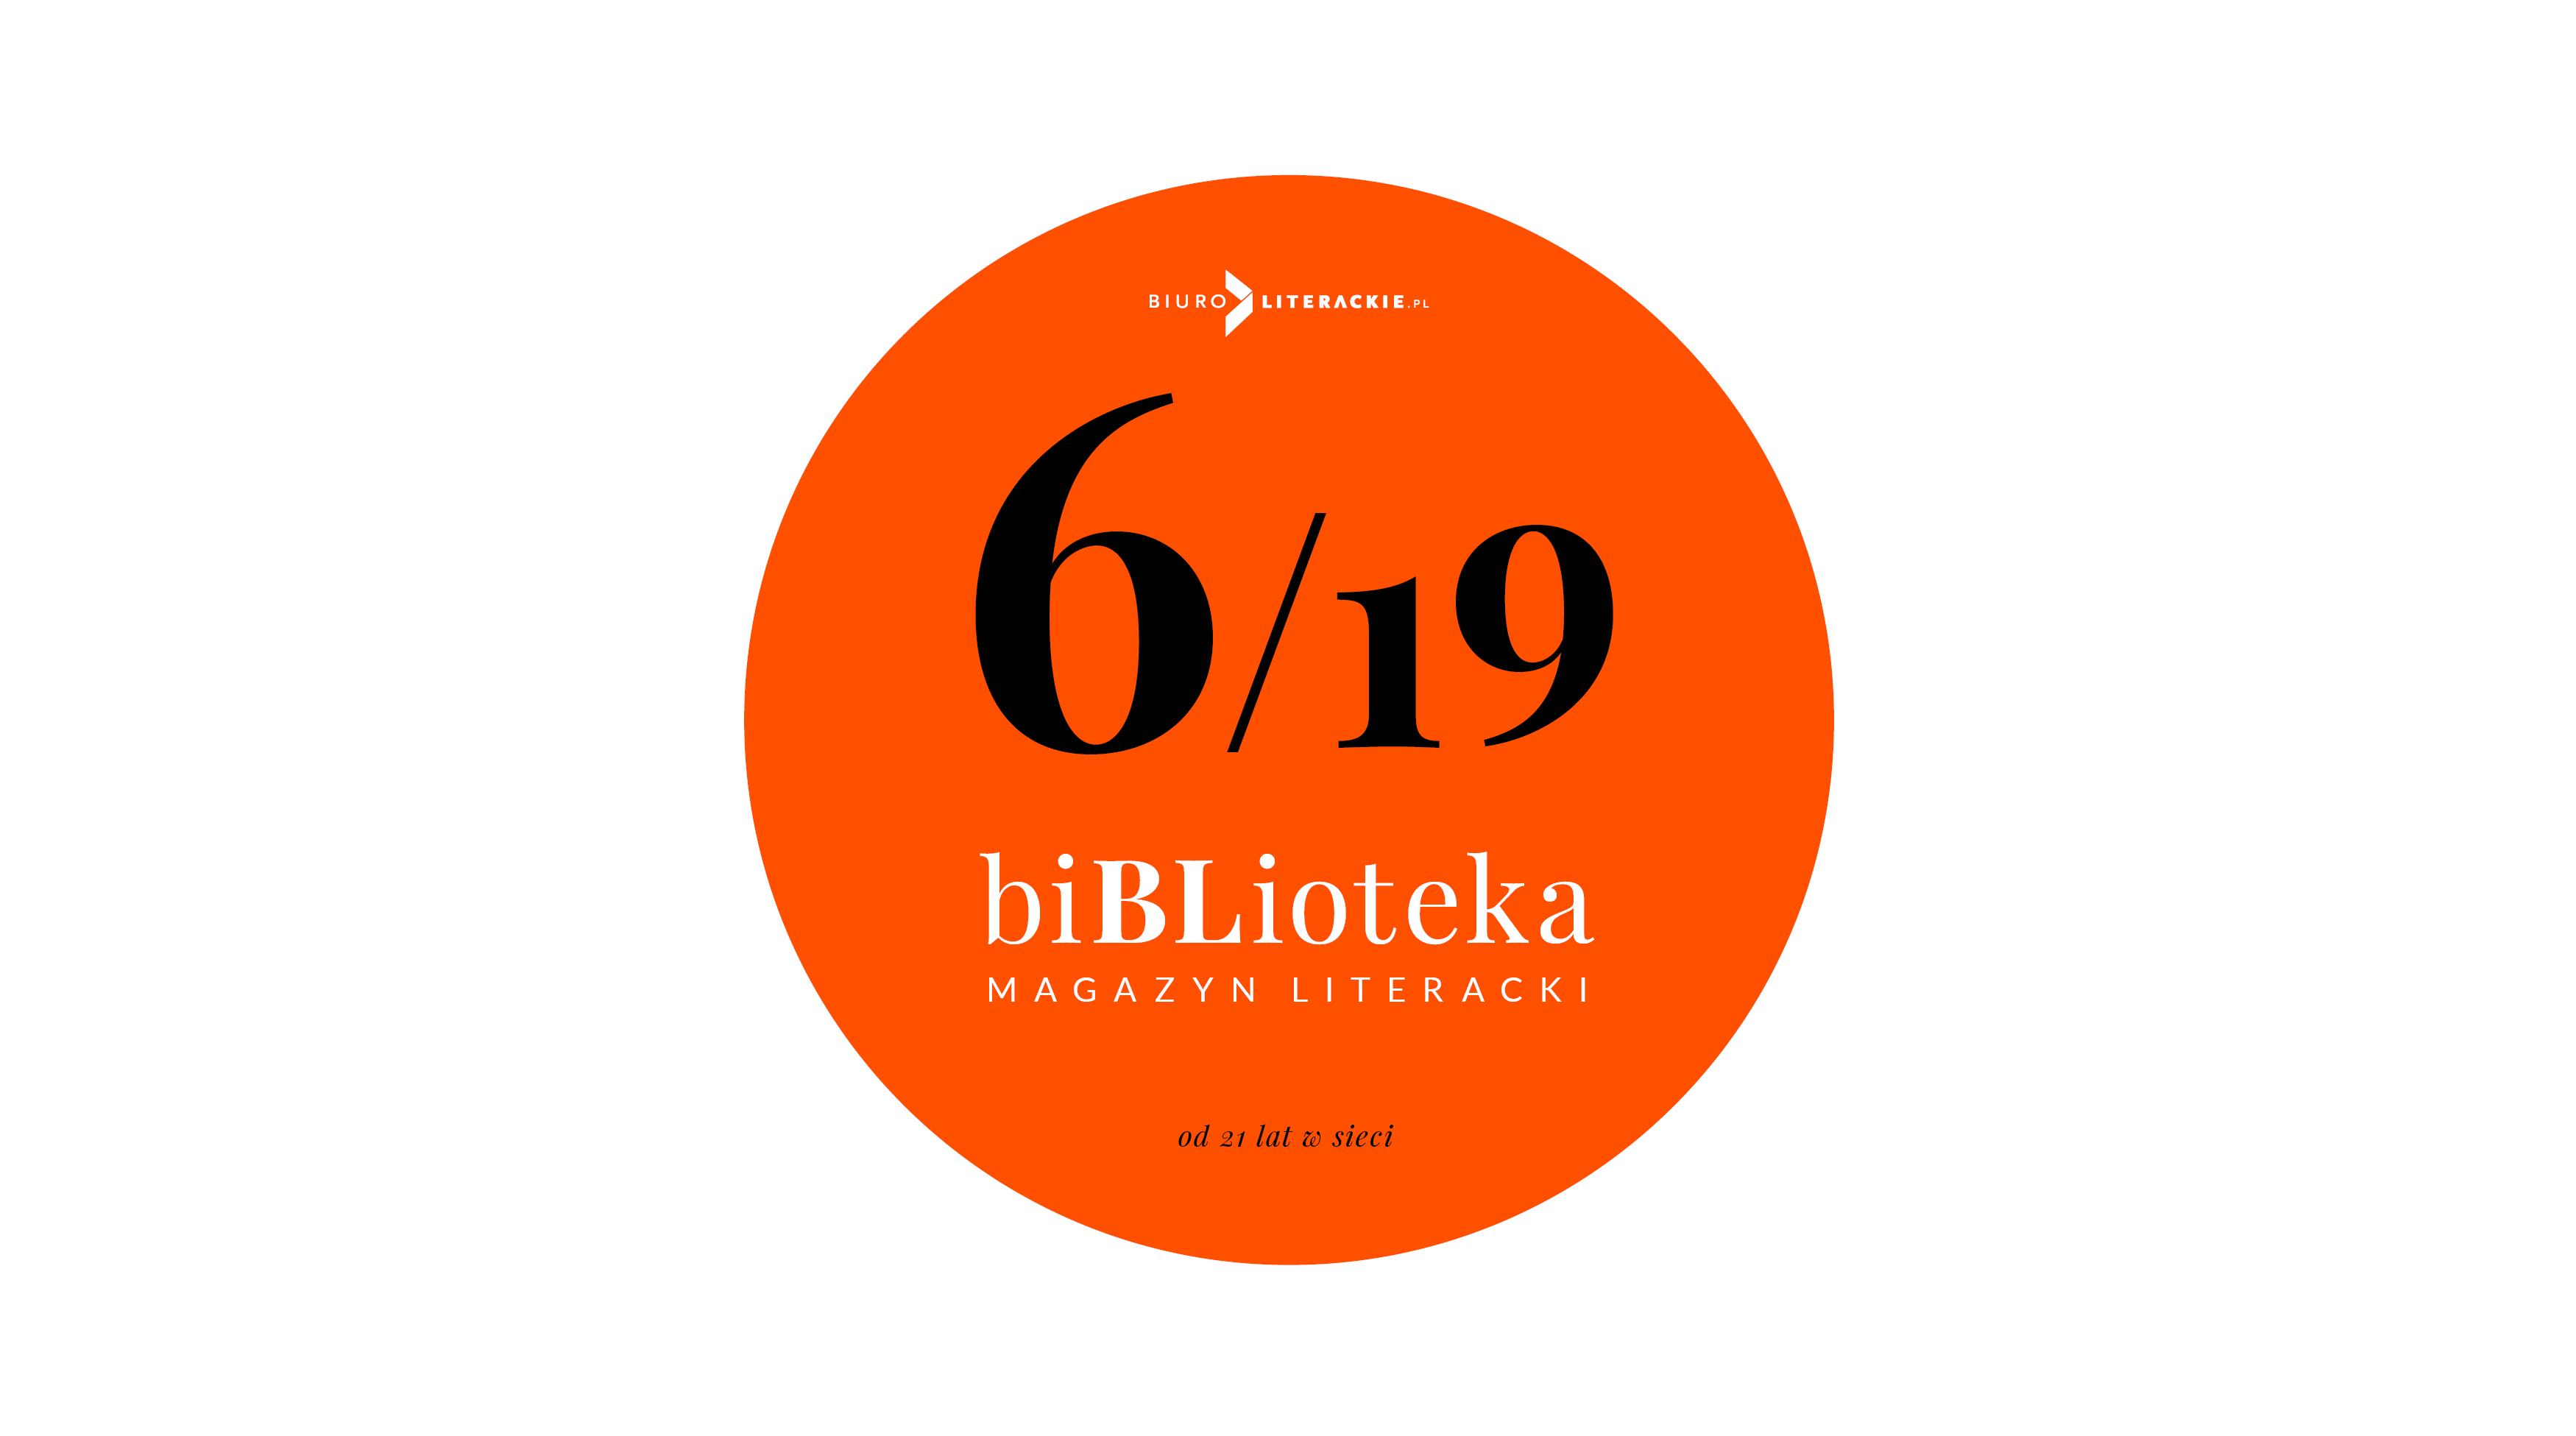 BL Img 2019.04.23 biBLioteka nr 6 2019__www_top